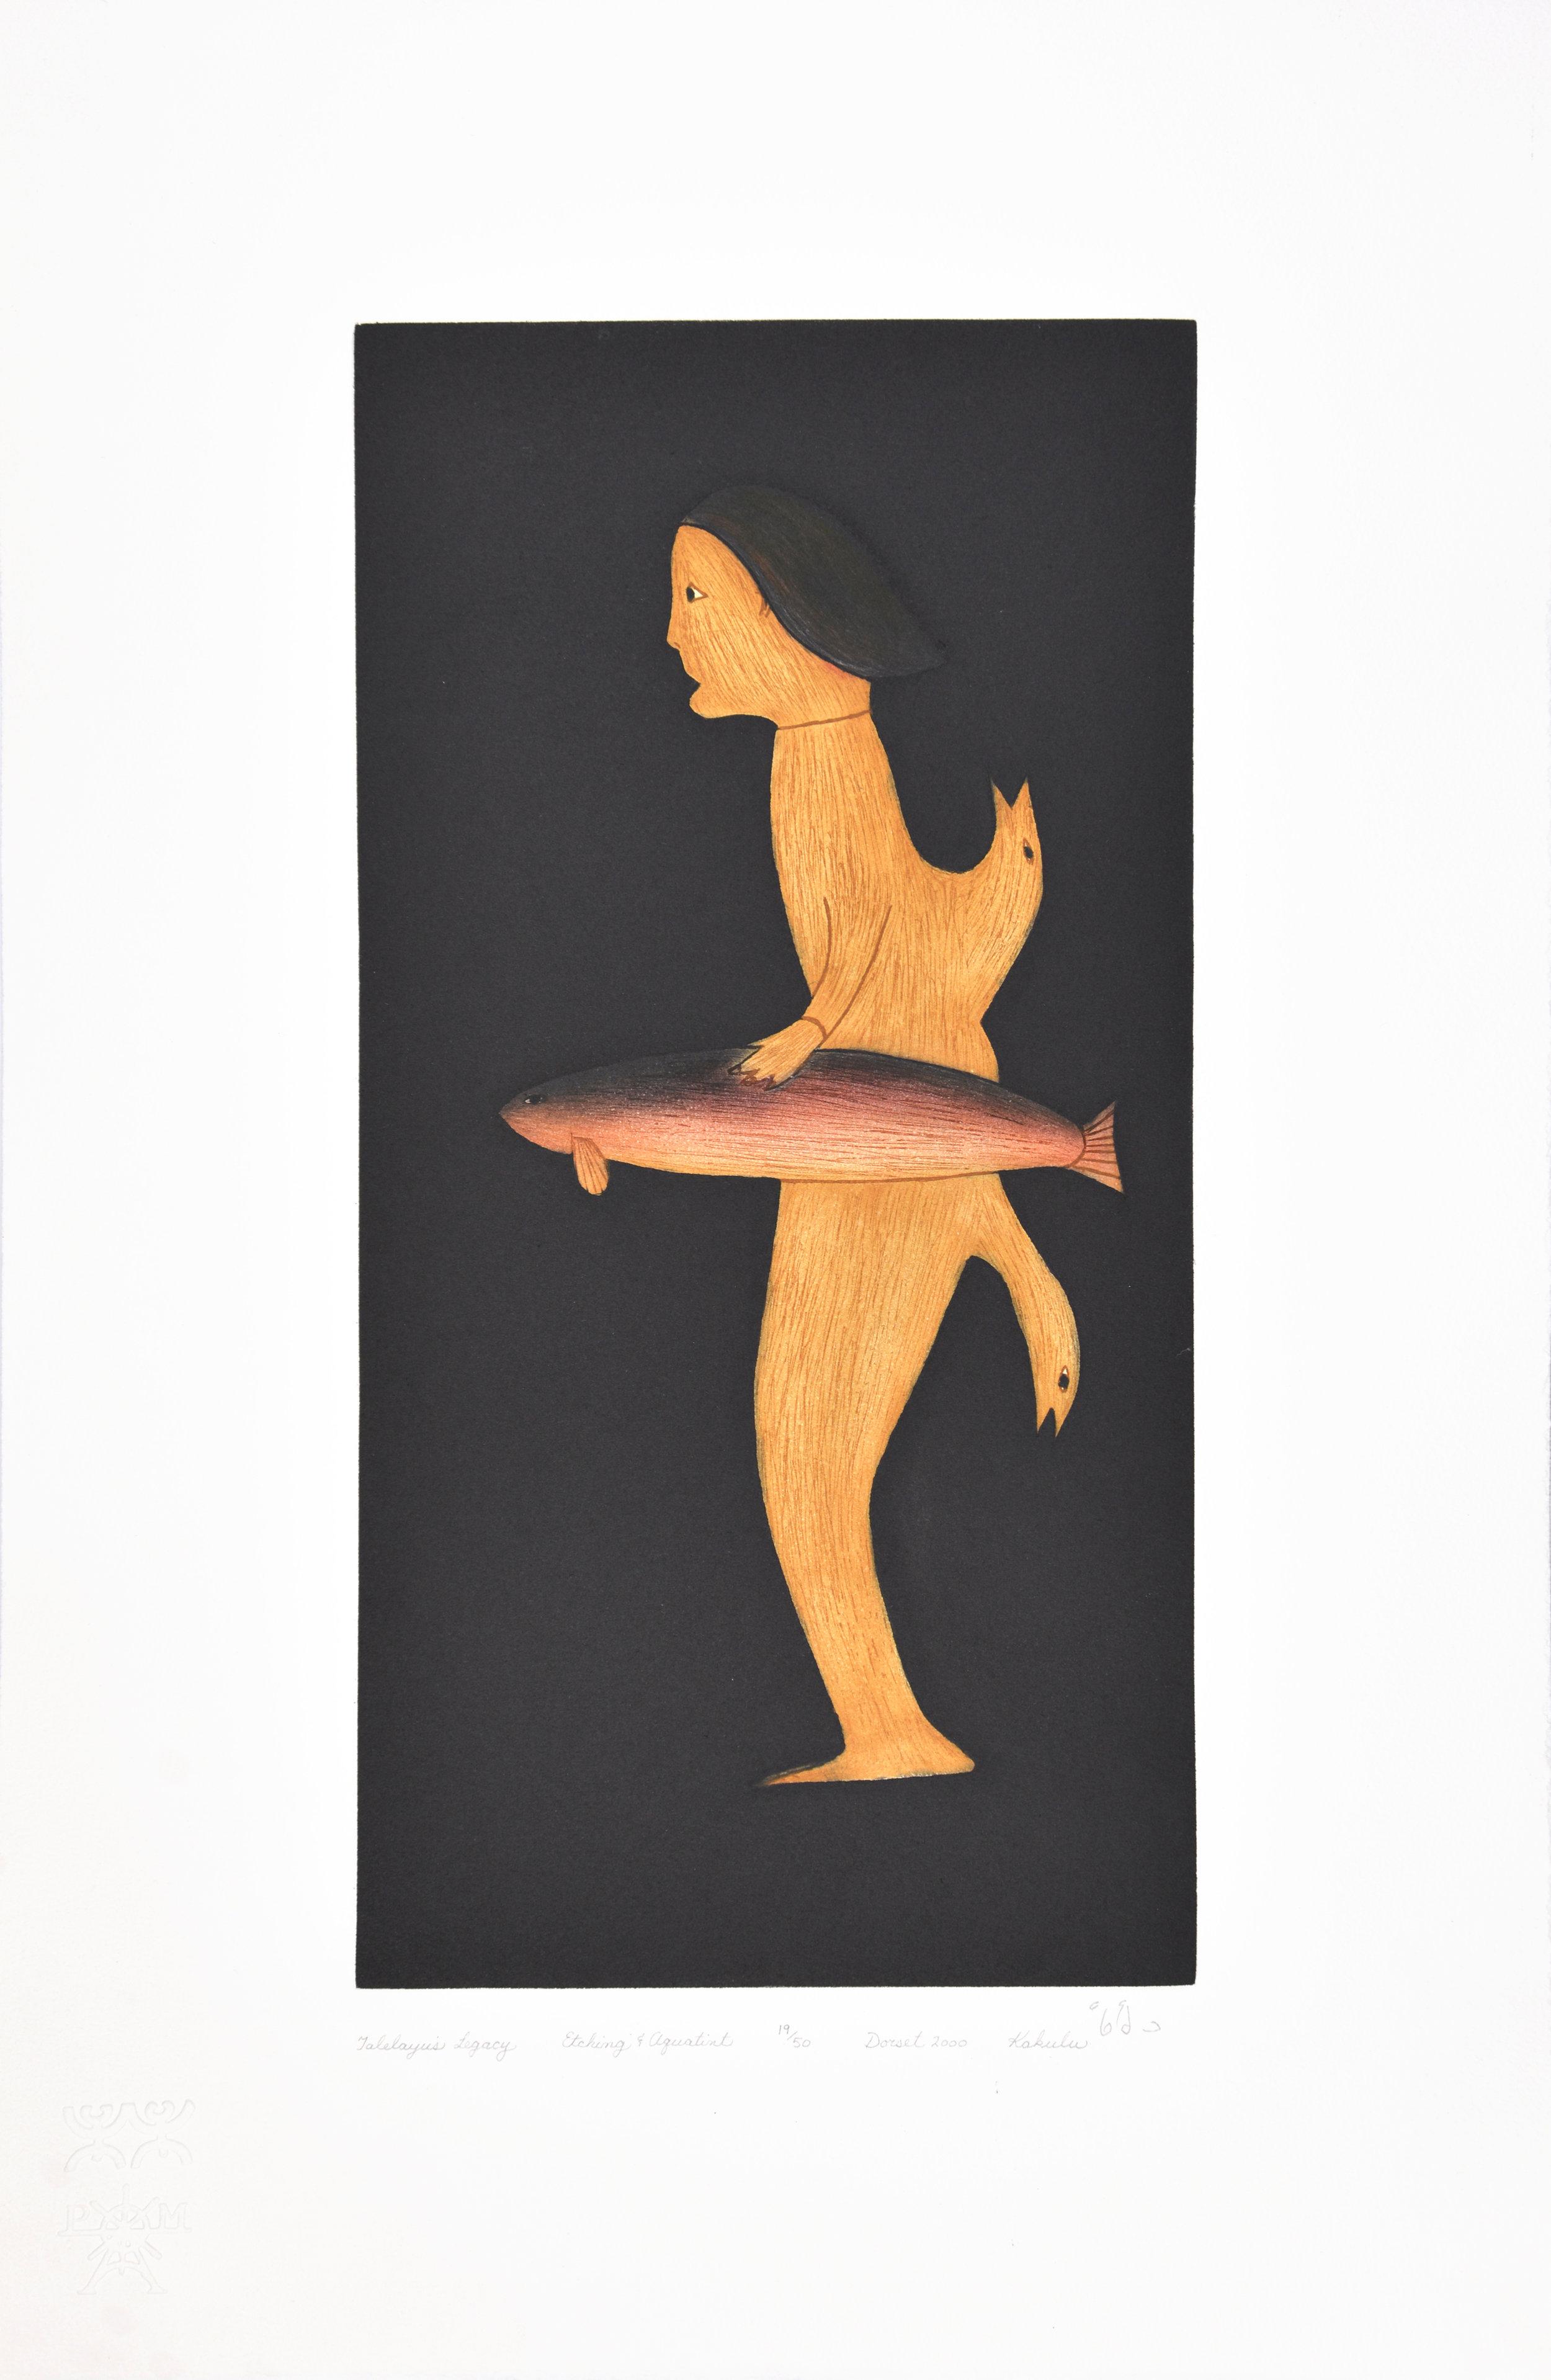 Kakulu Saggiaktok  TALELAYU'S LEGACY Etching & Aquatint 2000 60.5 x 40.5 cm $450.00 CDN Released in the 2000 Spring collection Dorset ID#: 2000-S07